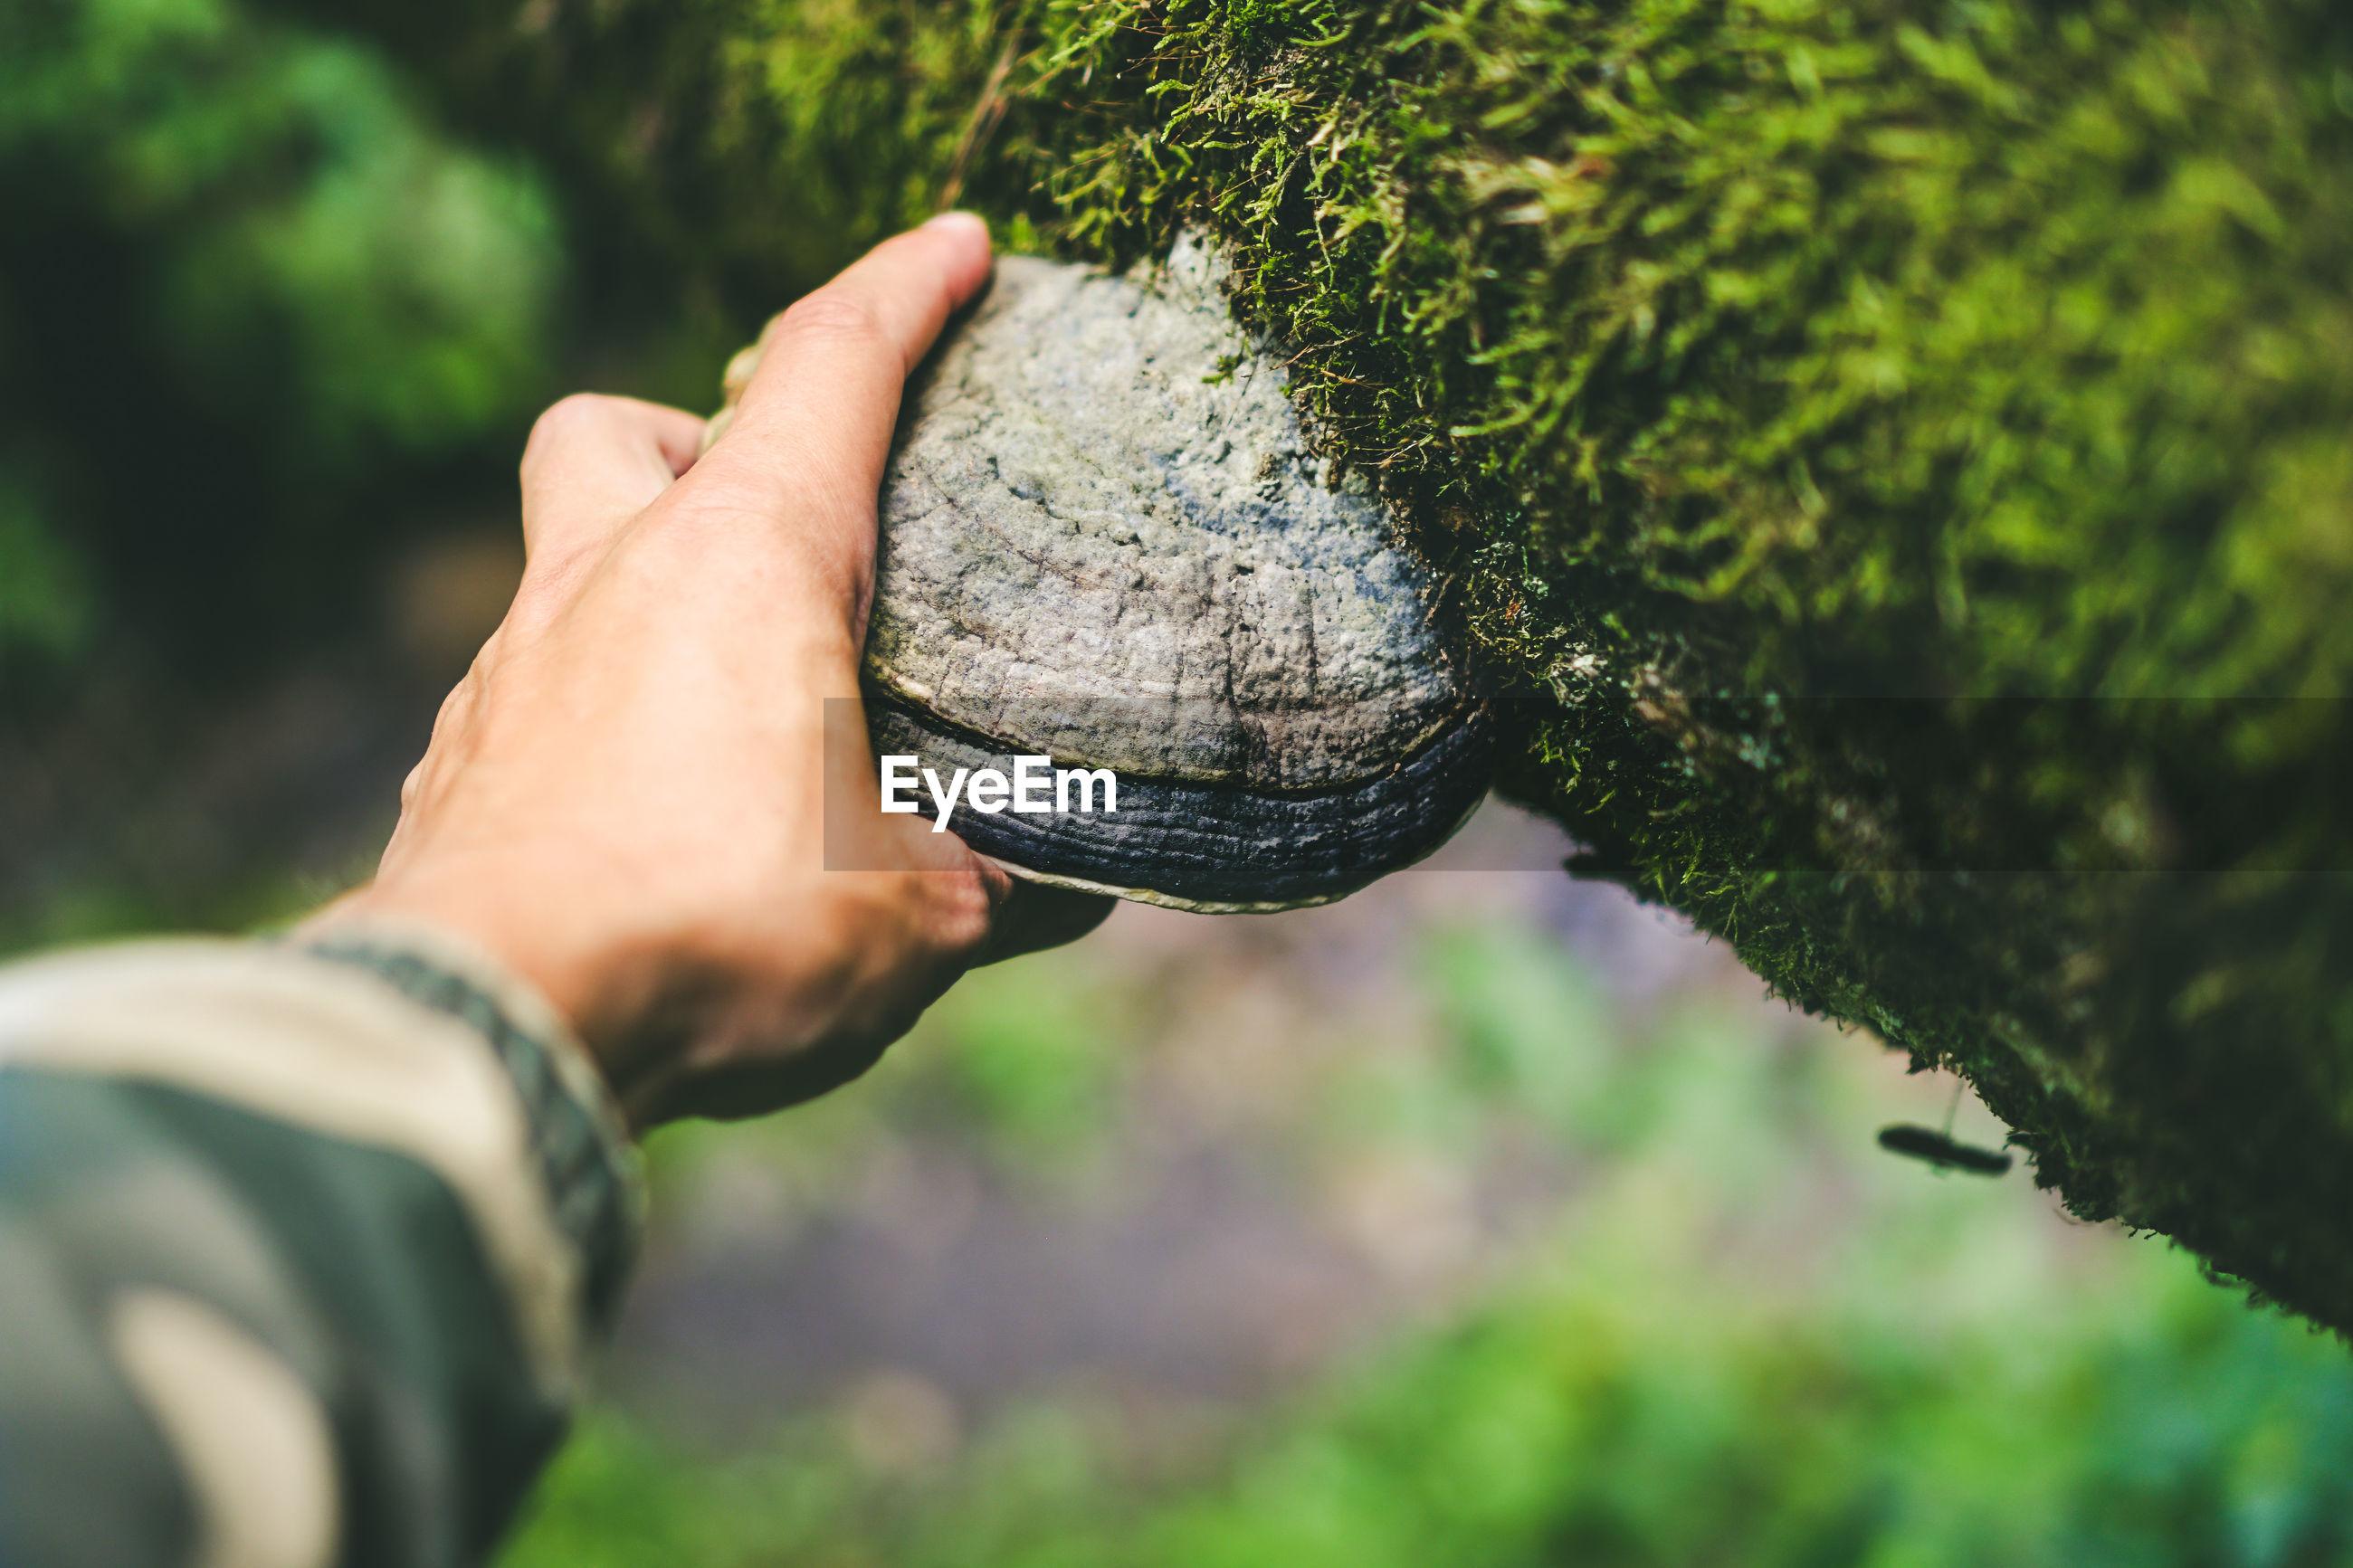 Cropped hand holding mushroom on tree trunk